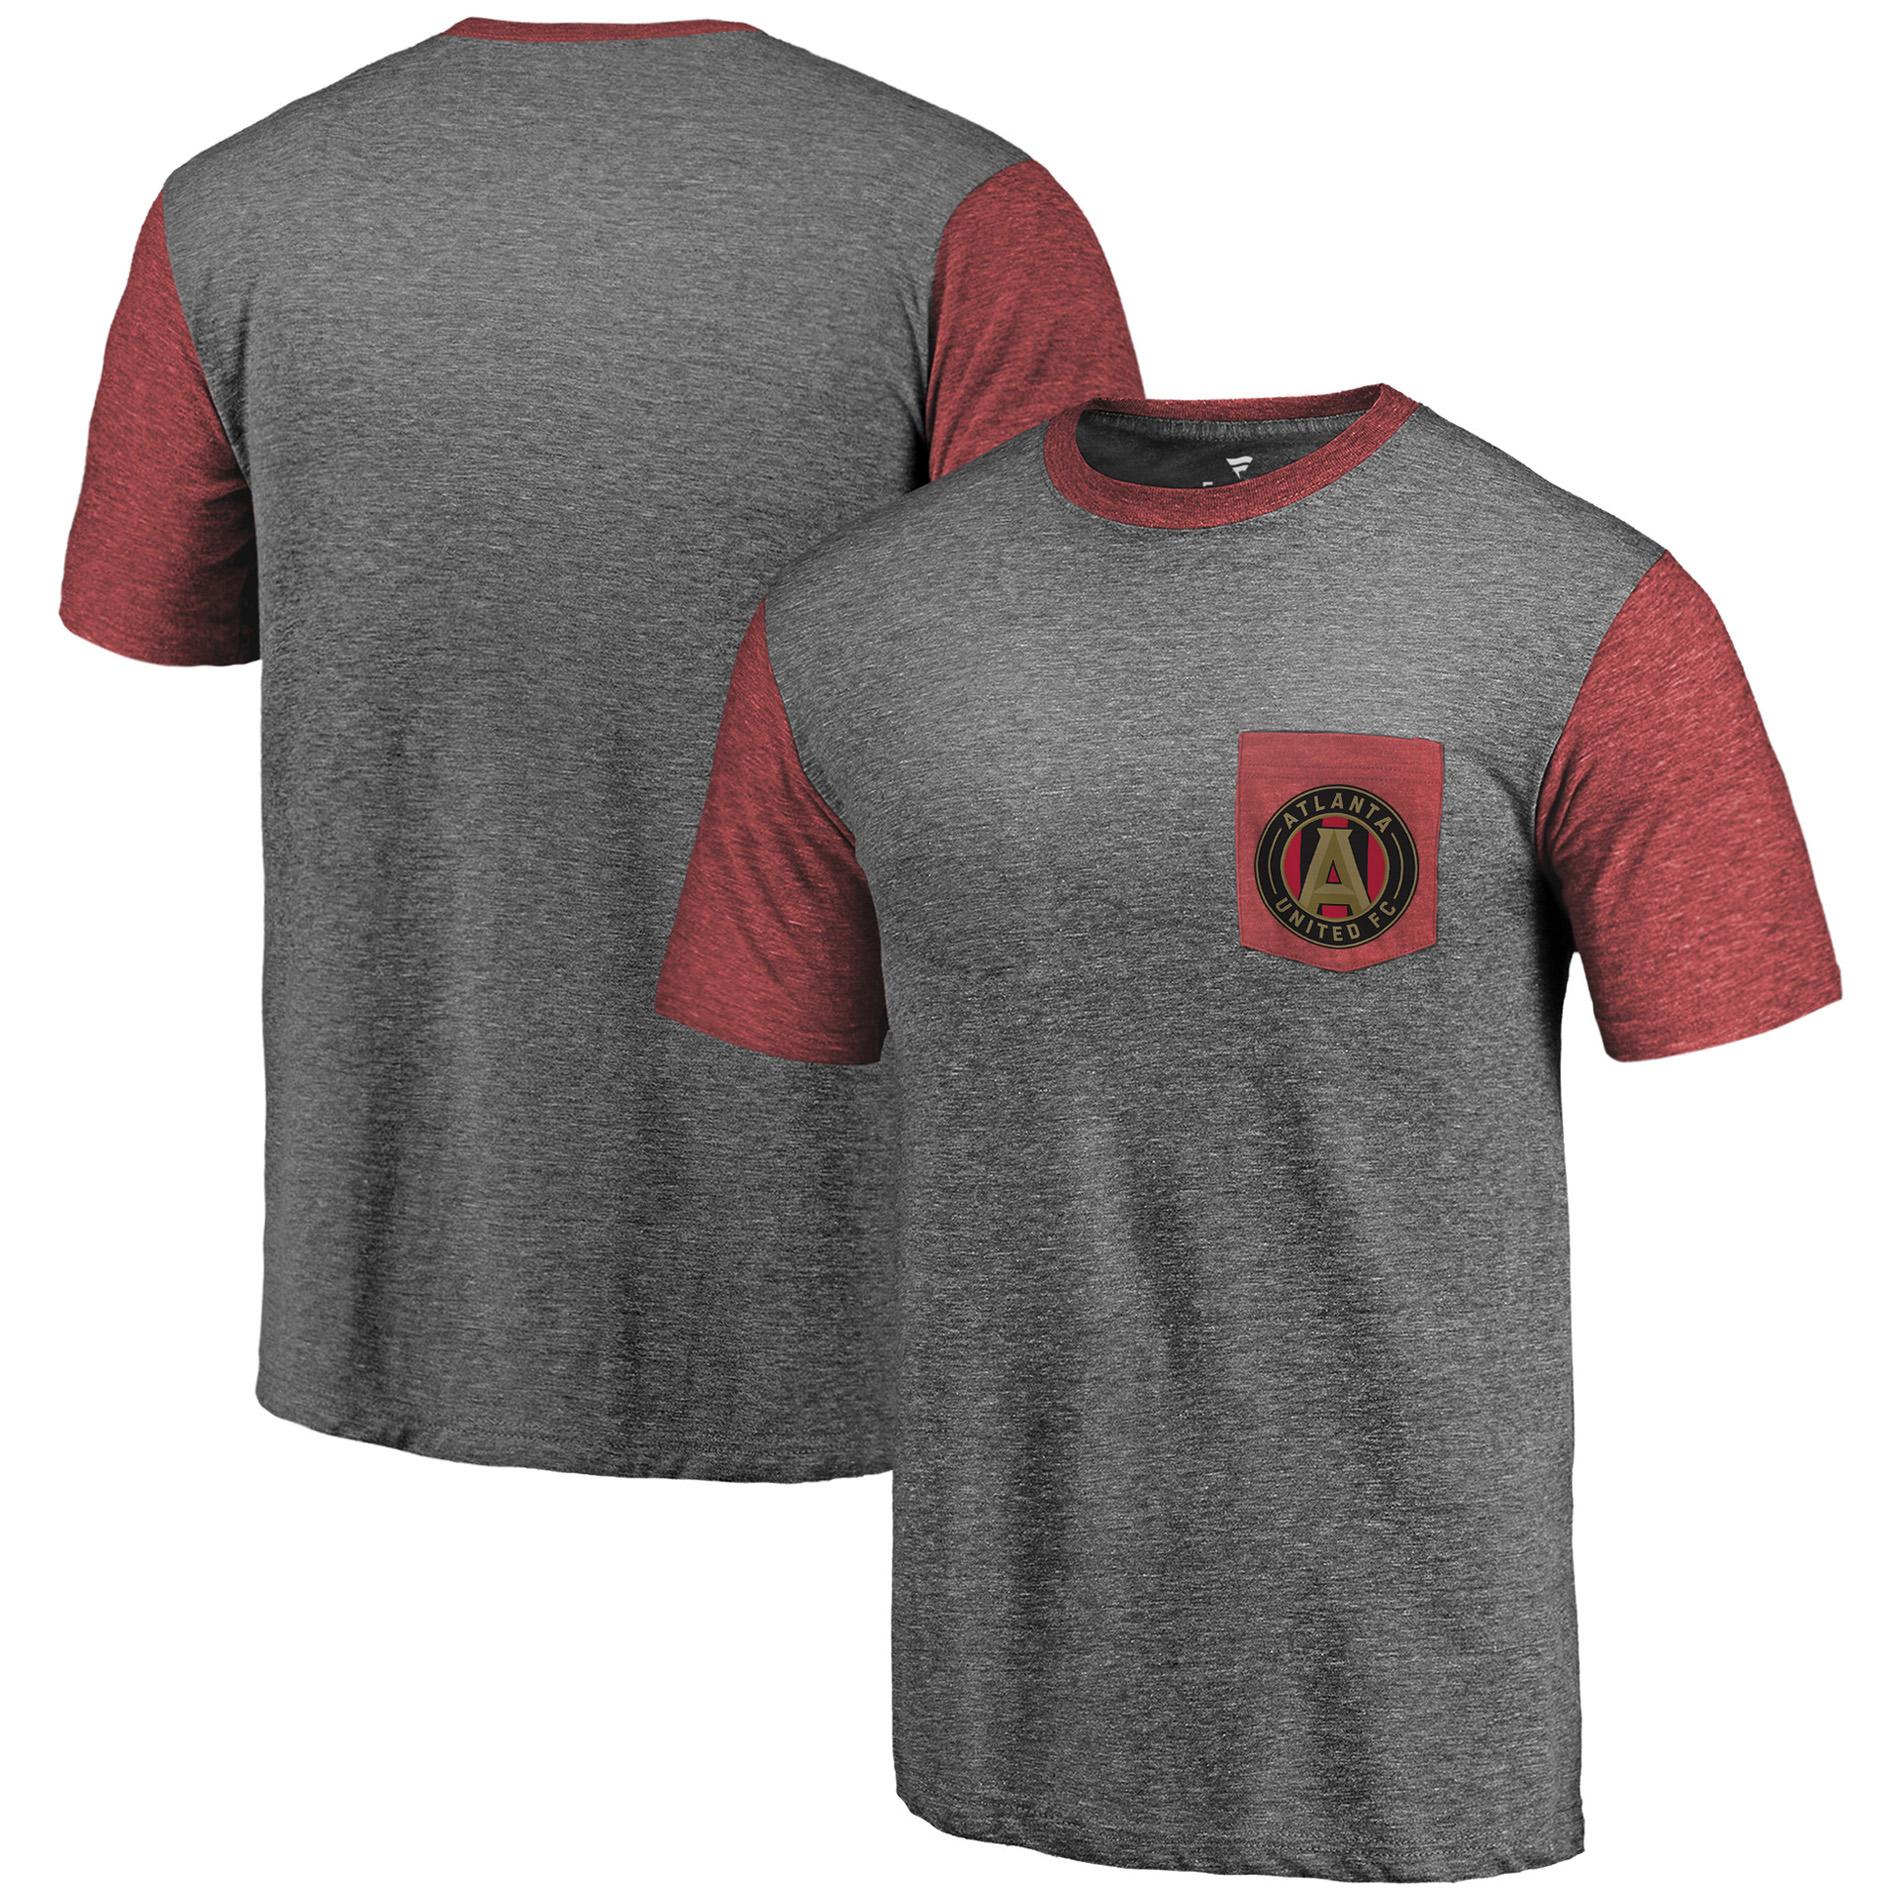 Atlanta United FC Fanatics Branded Tri-Blend Pocket T-Shirt - Heathered Gray/Red